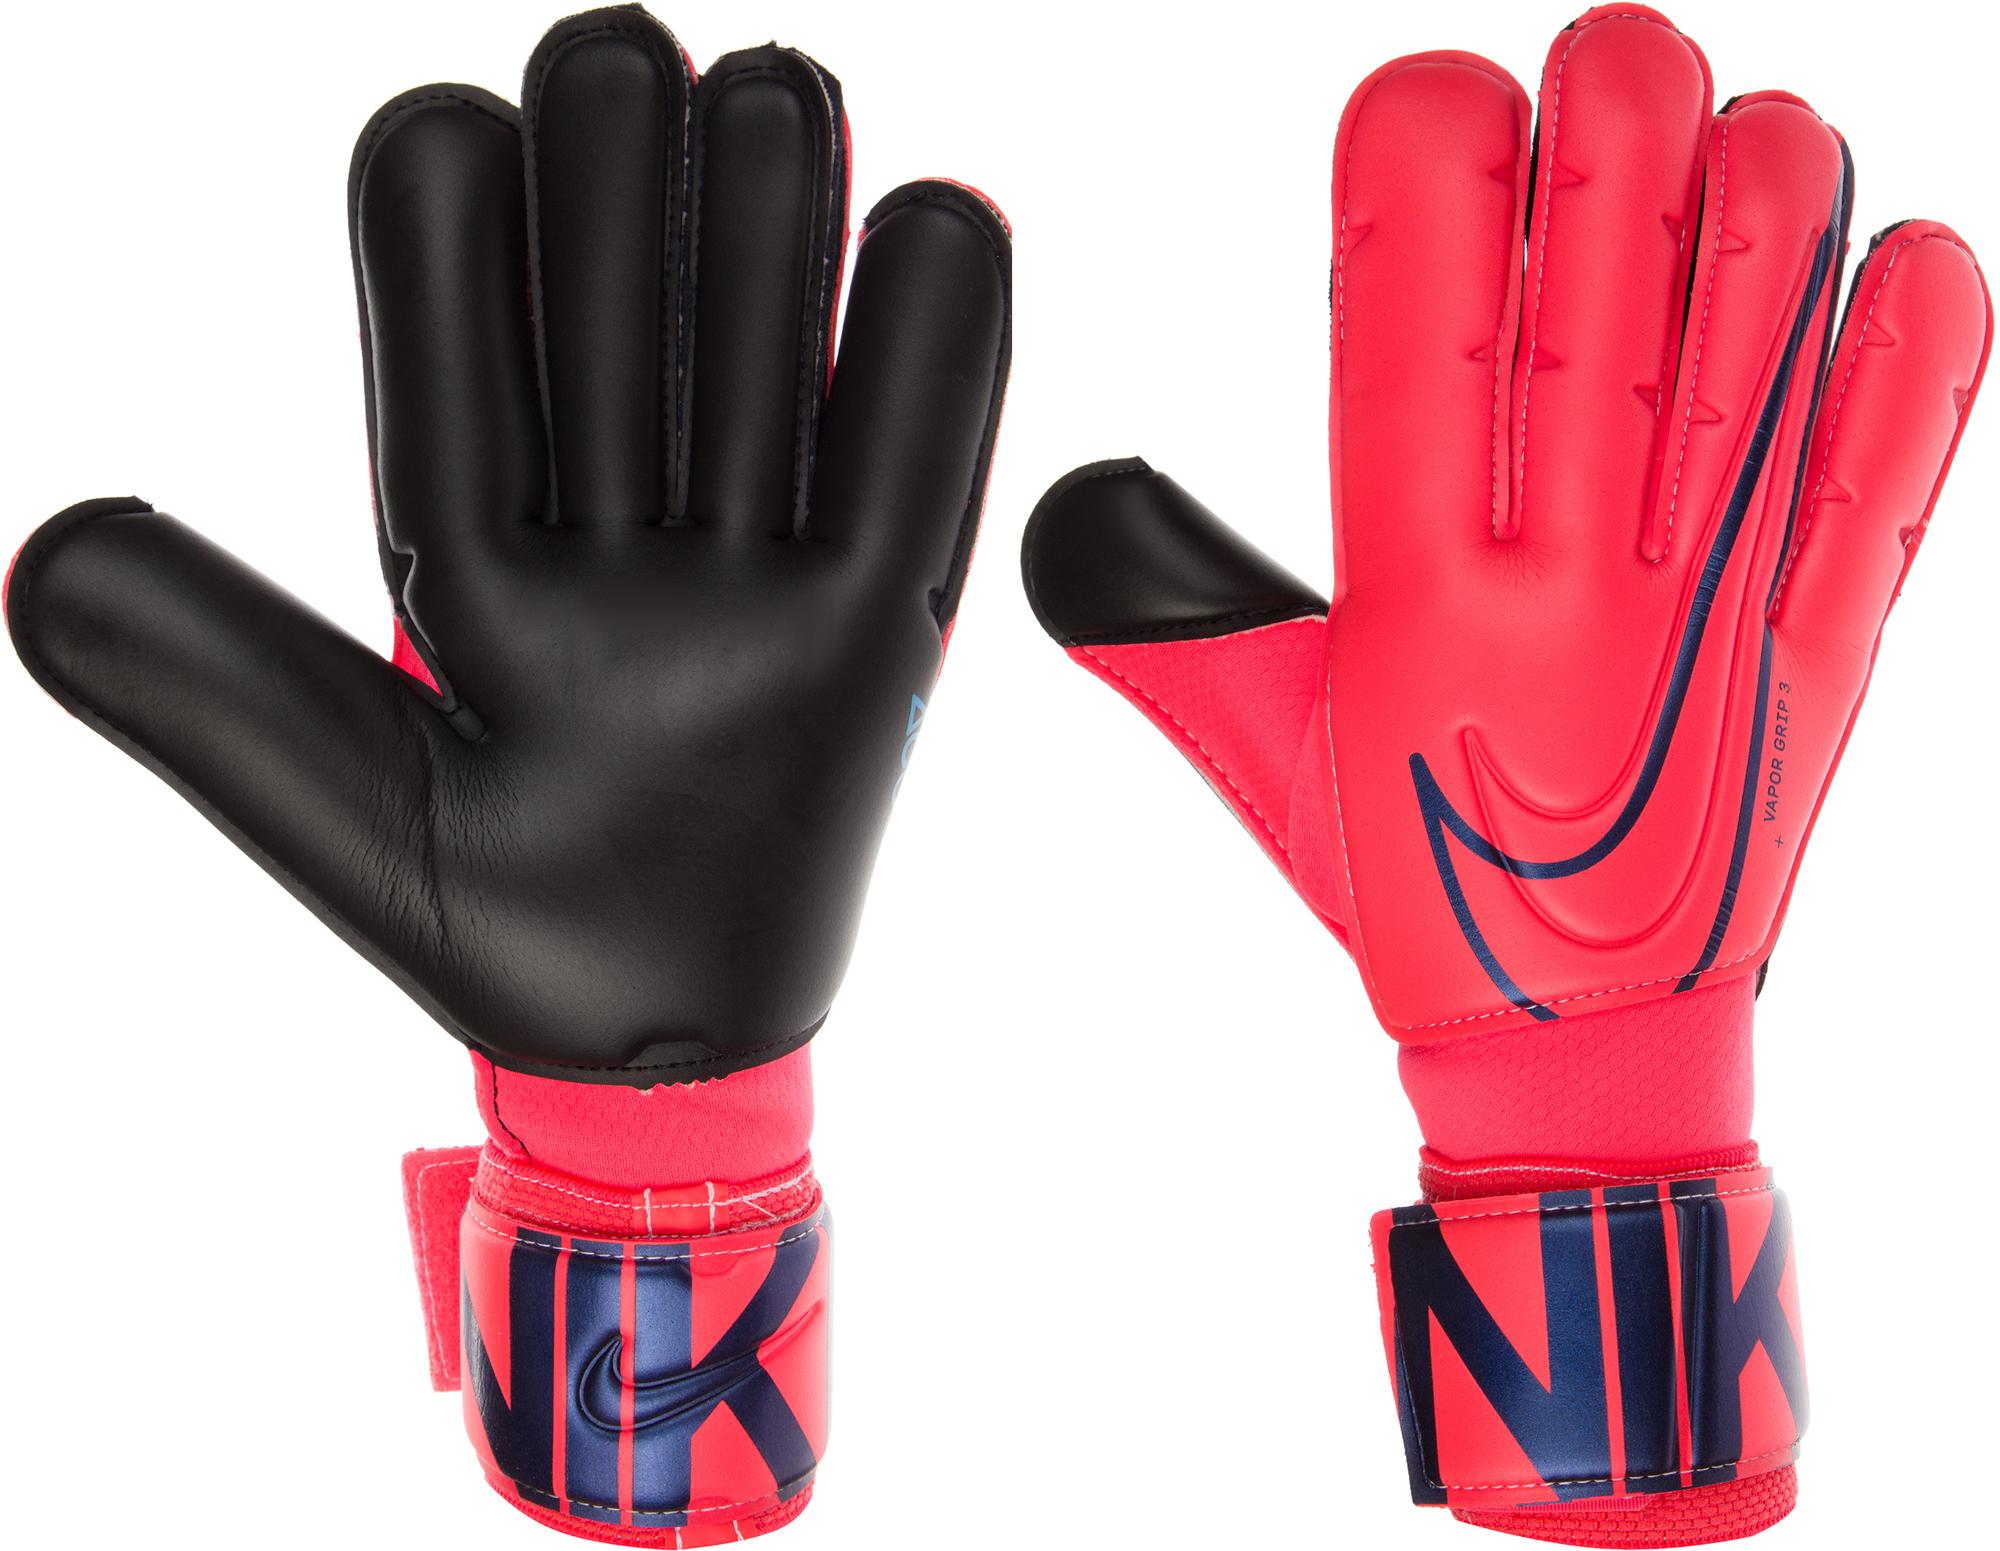 Nike NK GK VPR GRP3, размер 7 рюкзаки nike рюкзак nk fb cntrln bkpk